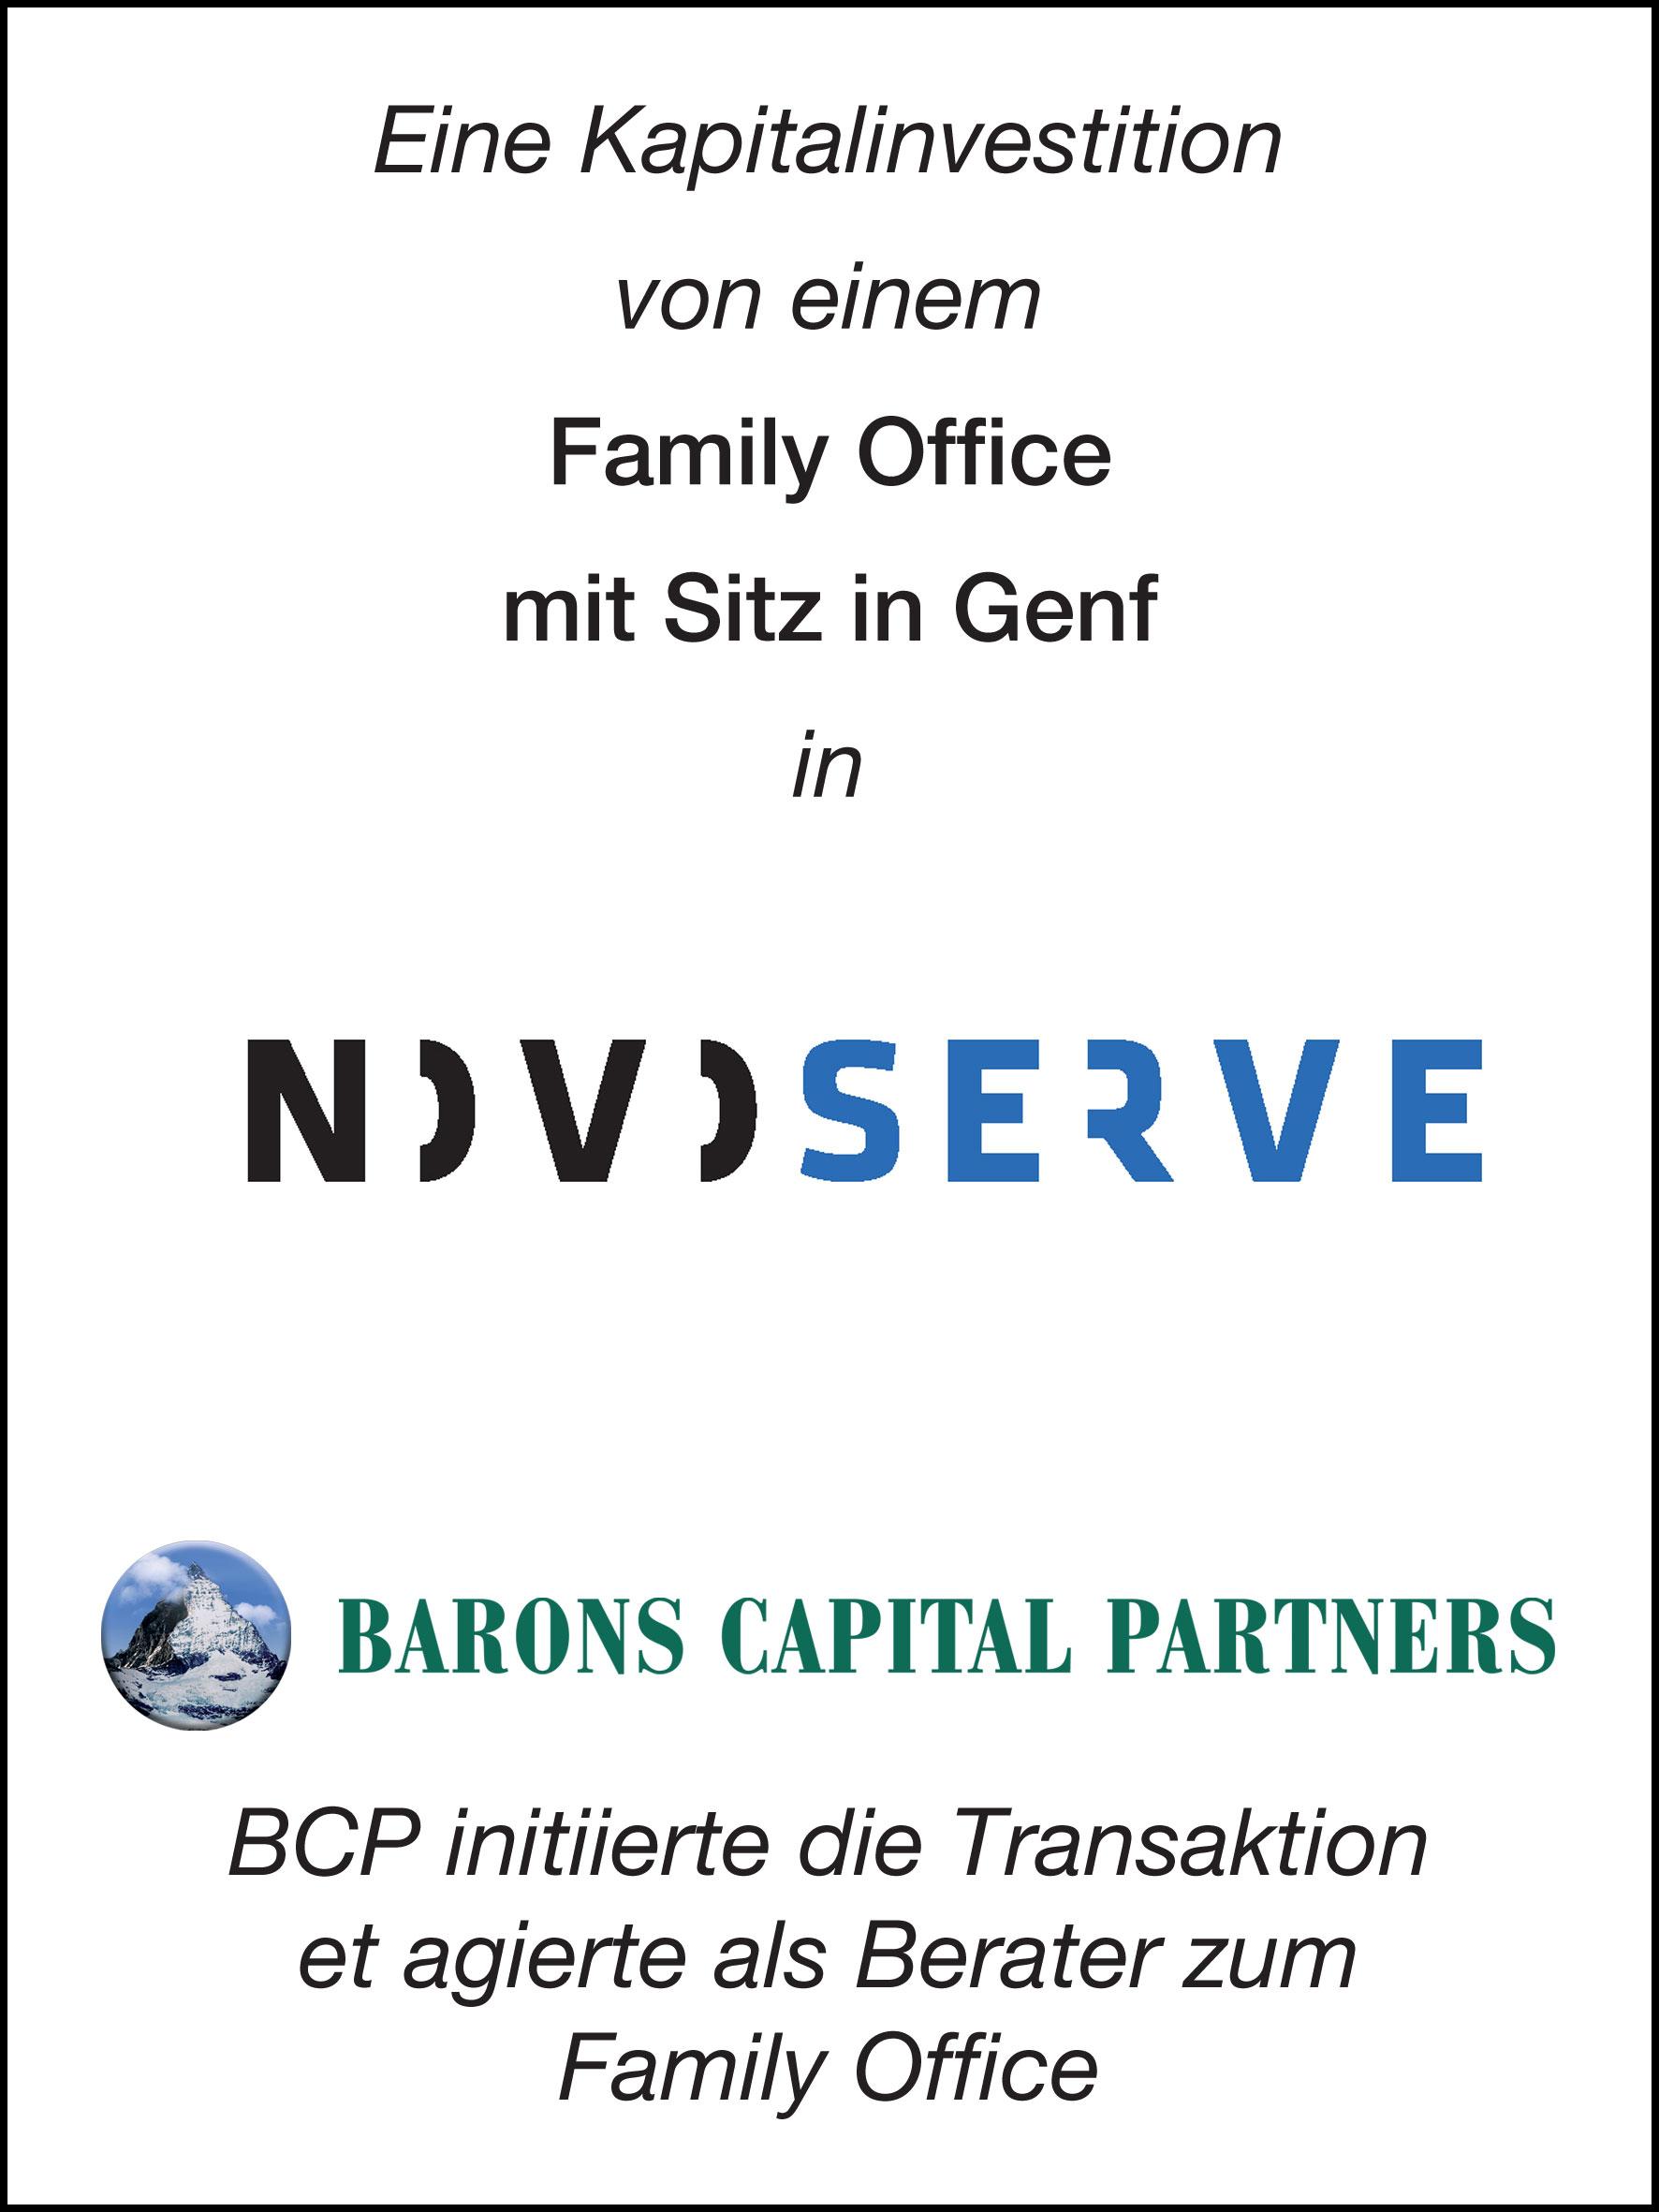 3_Novo Internet Ventures GmbH_G